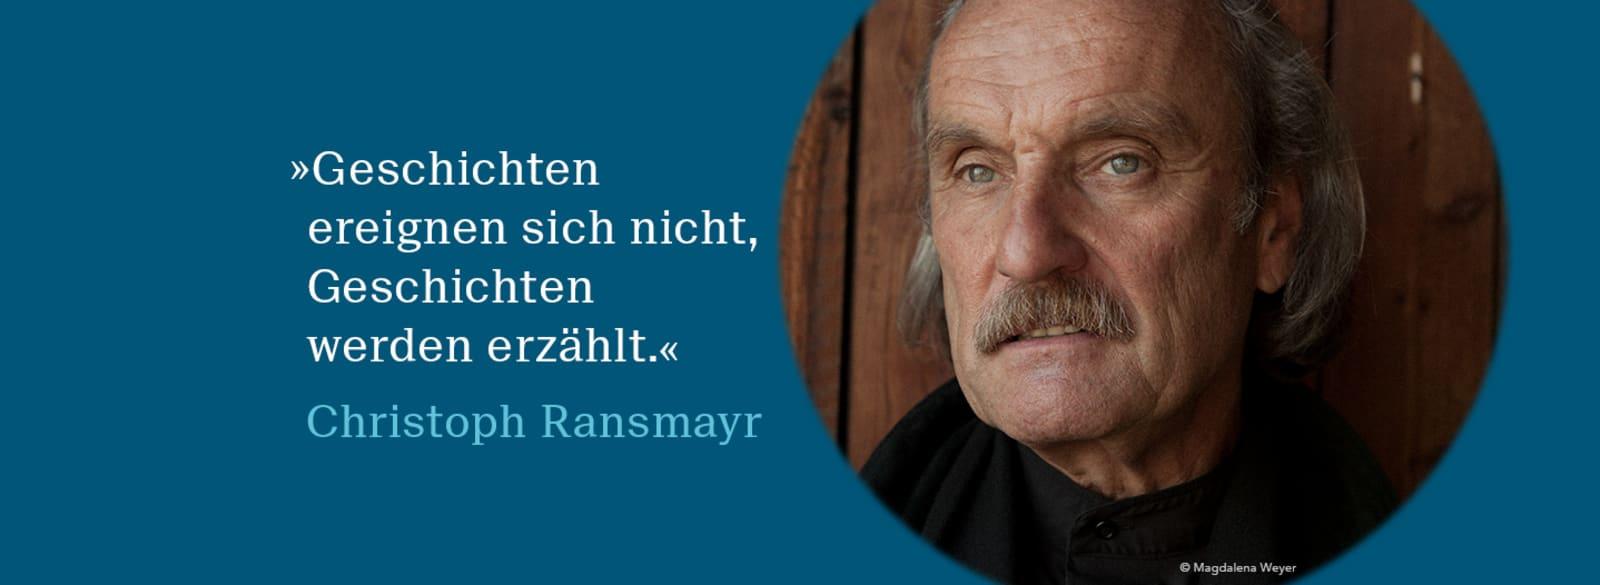 Christoph Ransmayr Banner